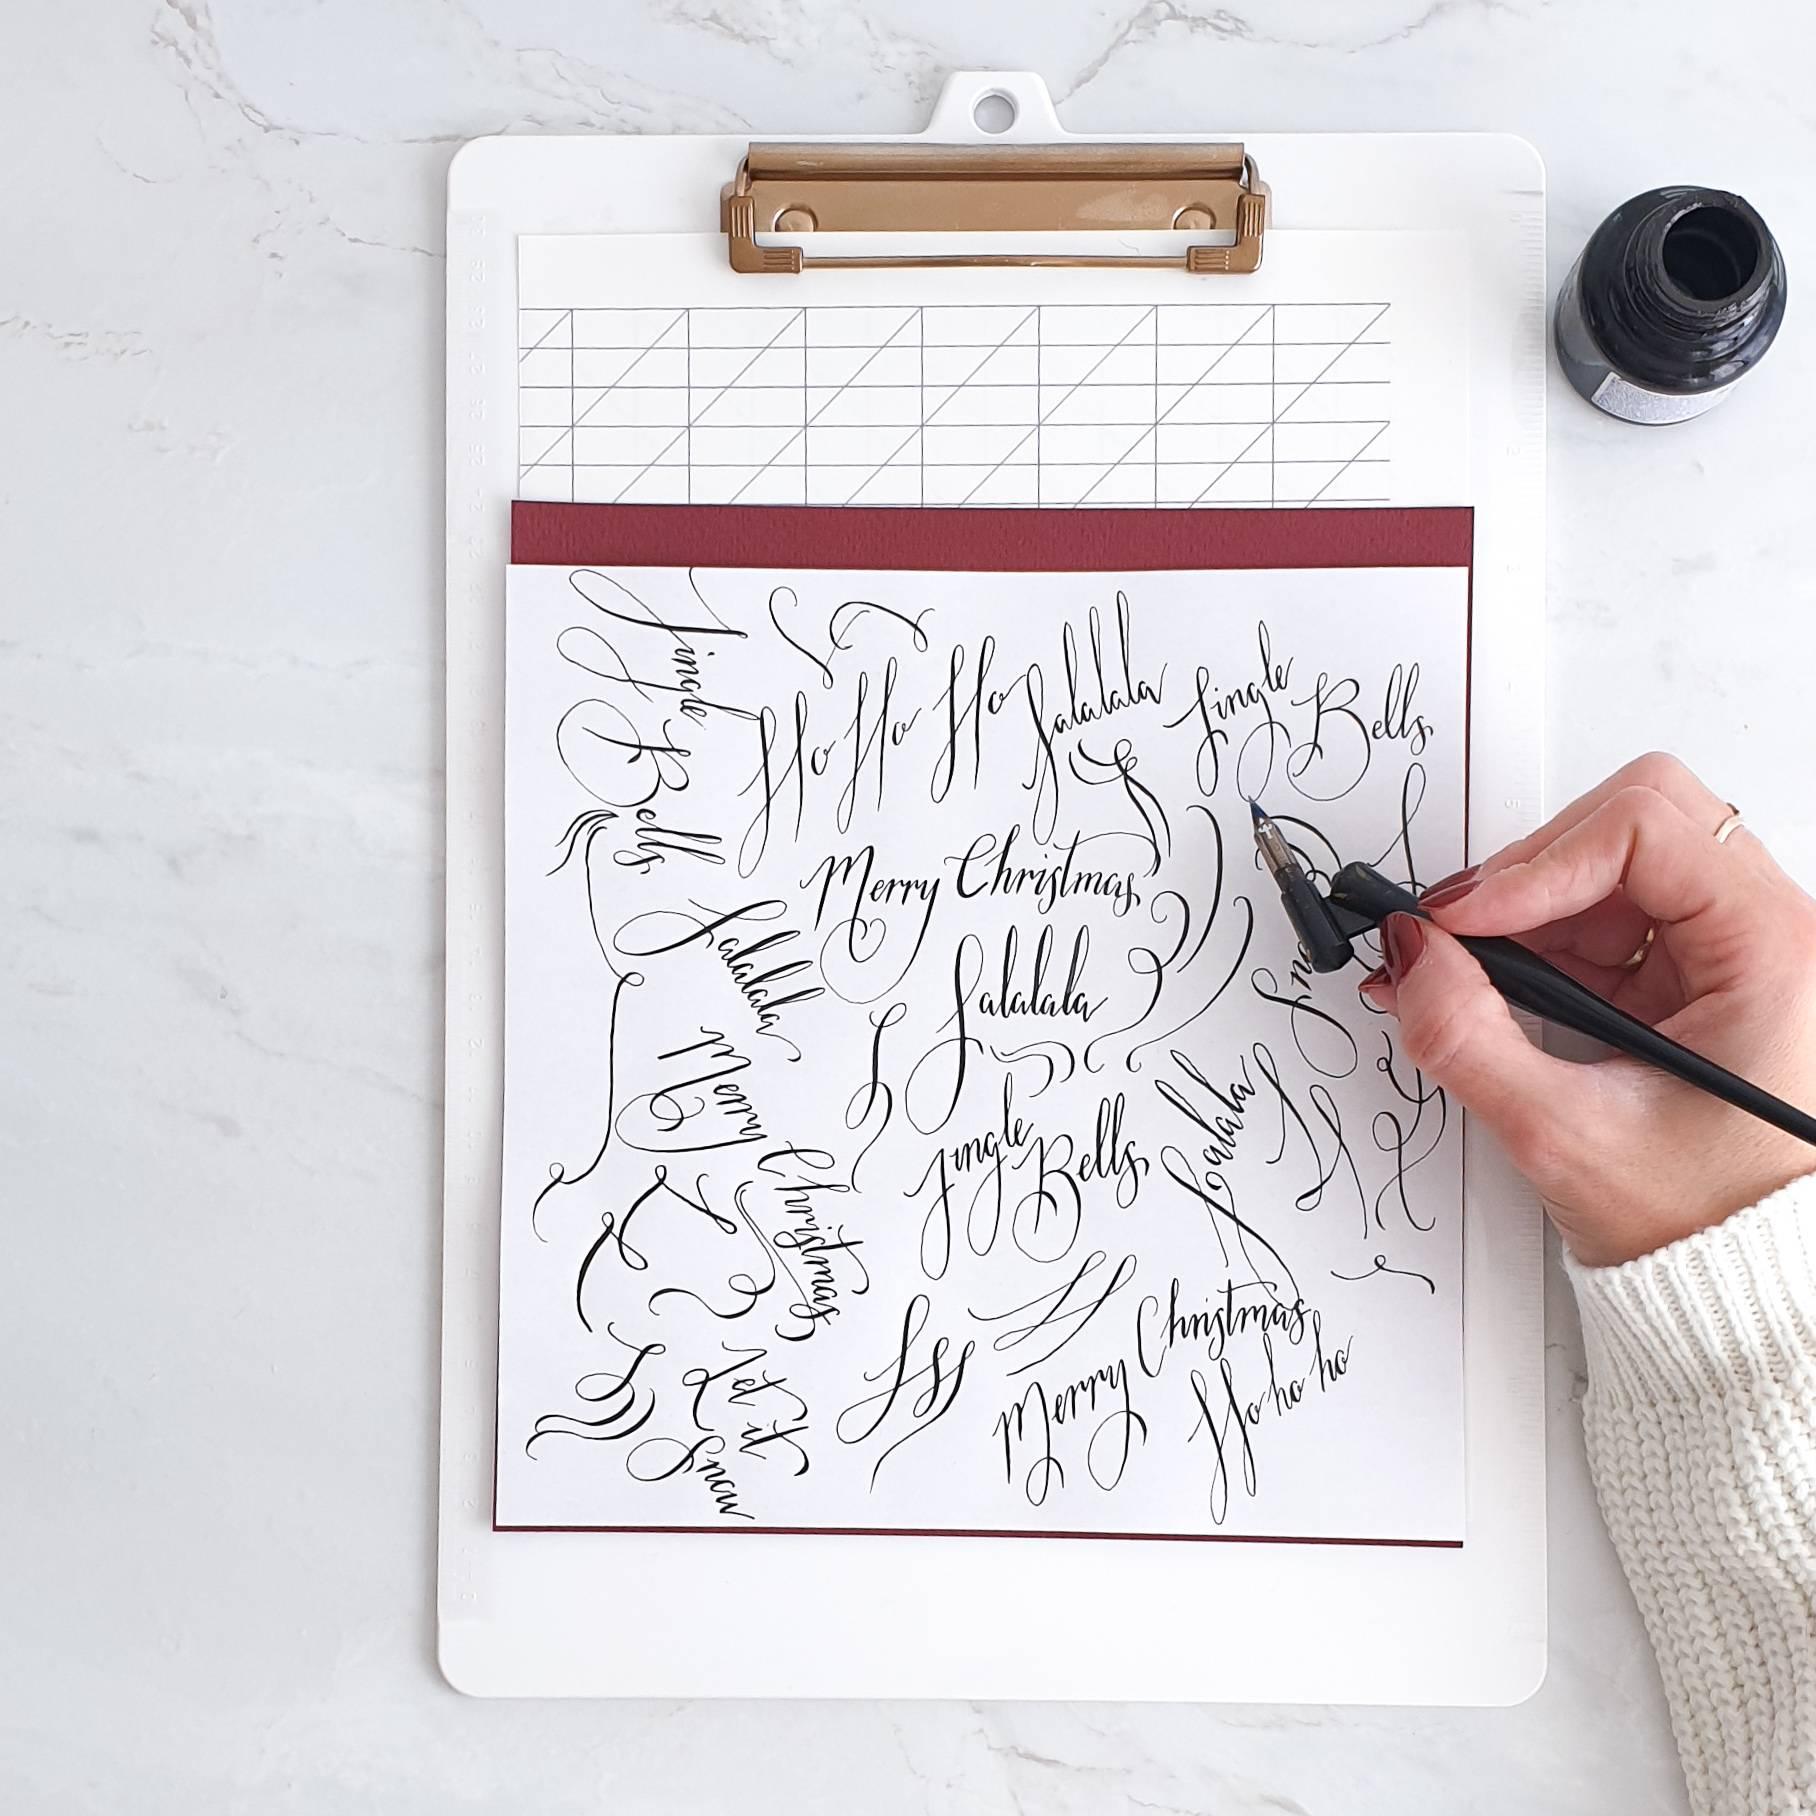 Calligraphy Workshop in Geneva, Switzerland